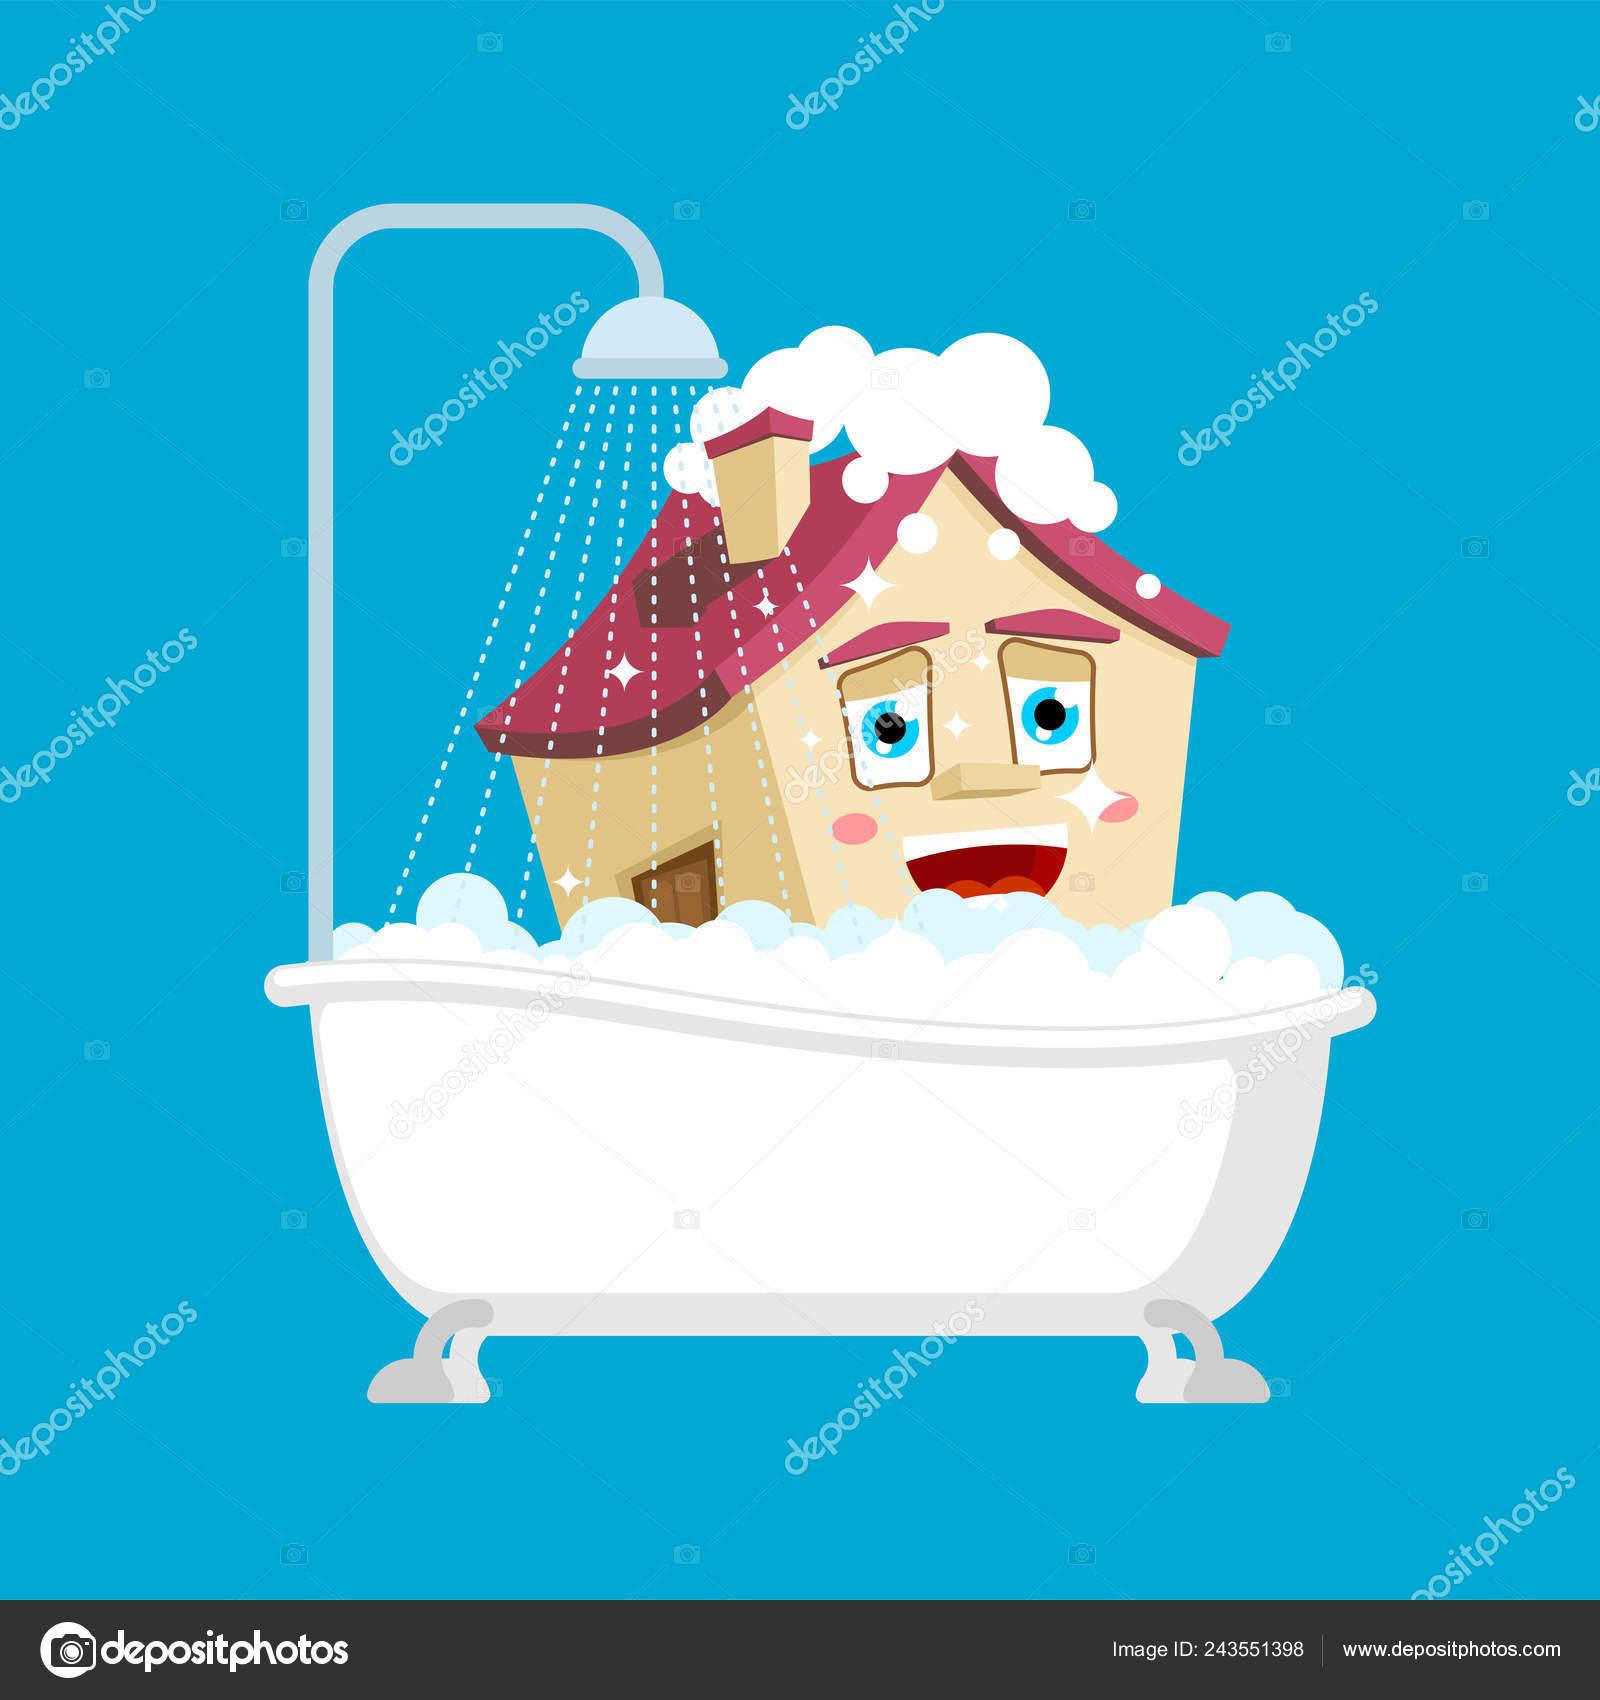 Casa Limpia Baño Aislado Casa Baño Estilo Dibujos Animados